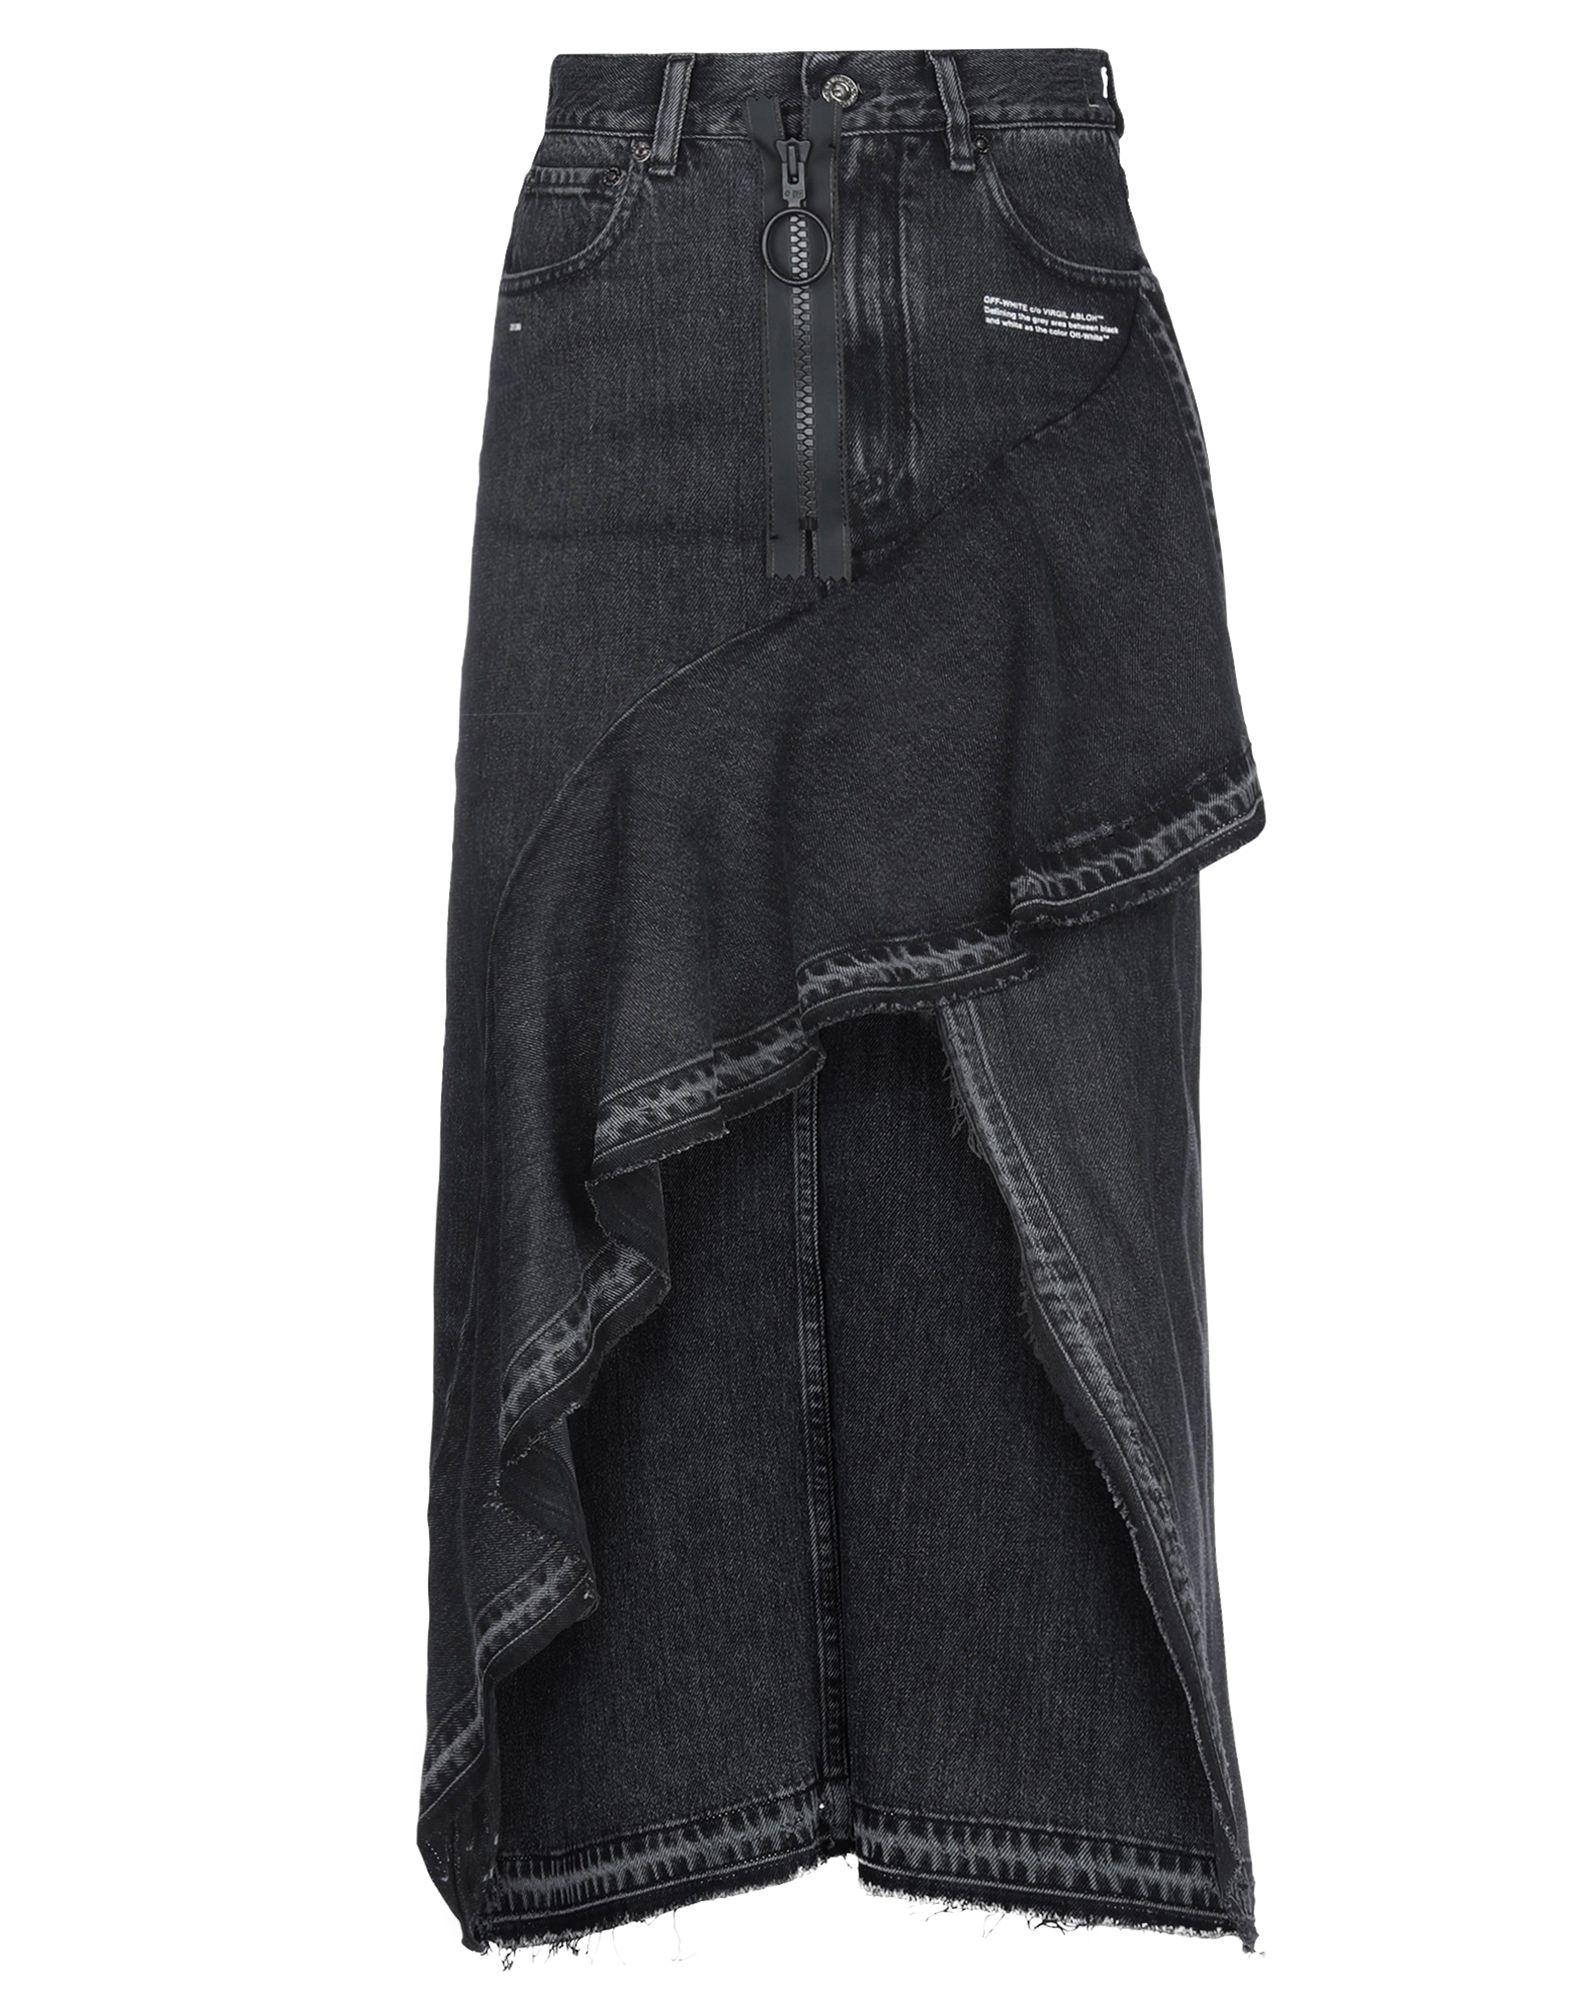 OFF-WHITE™ Denim skirts. denim, print, logo, solid color, colored wash, belt loops, front closure, zip, multipockets, raw-cut hem. 100% Cotton